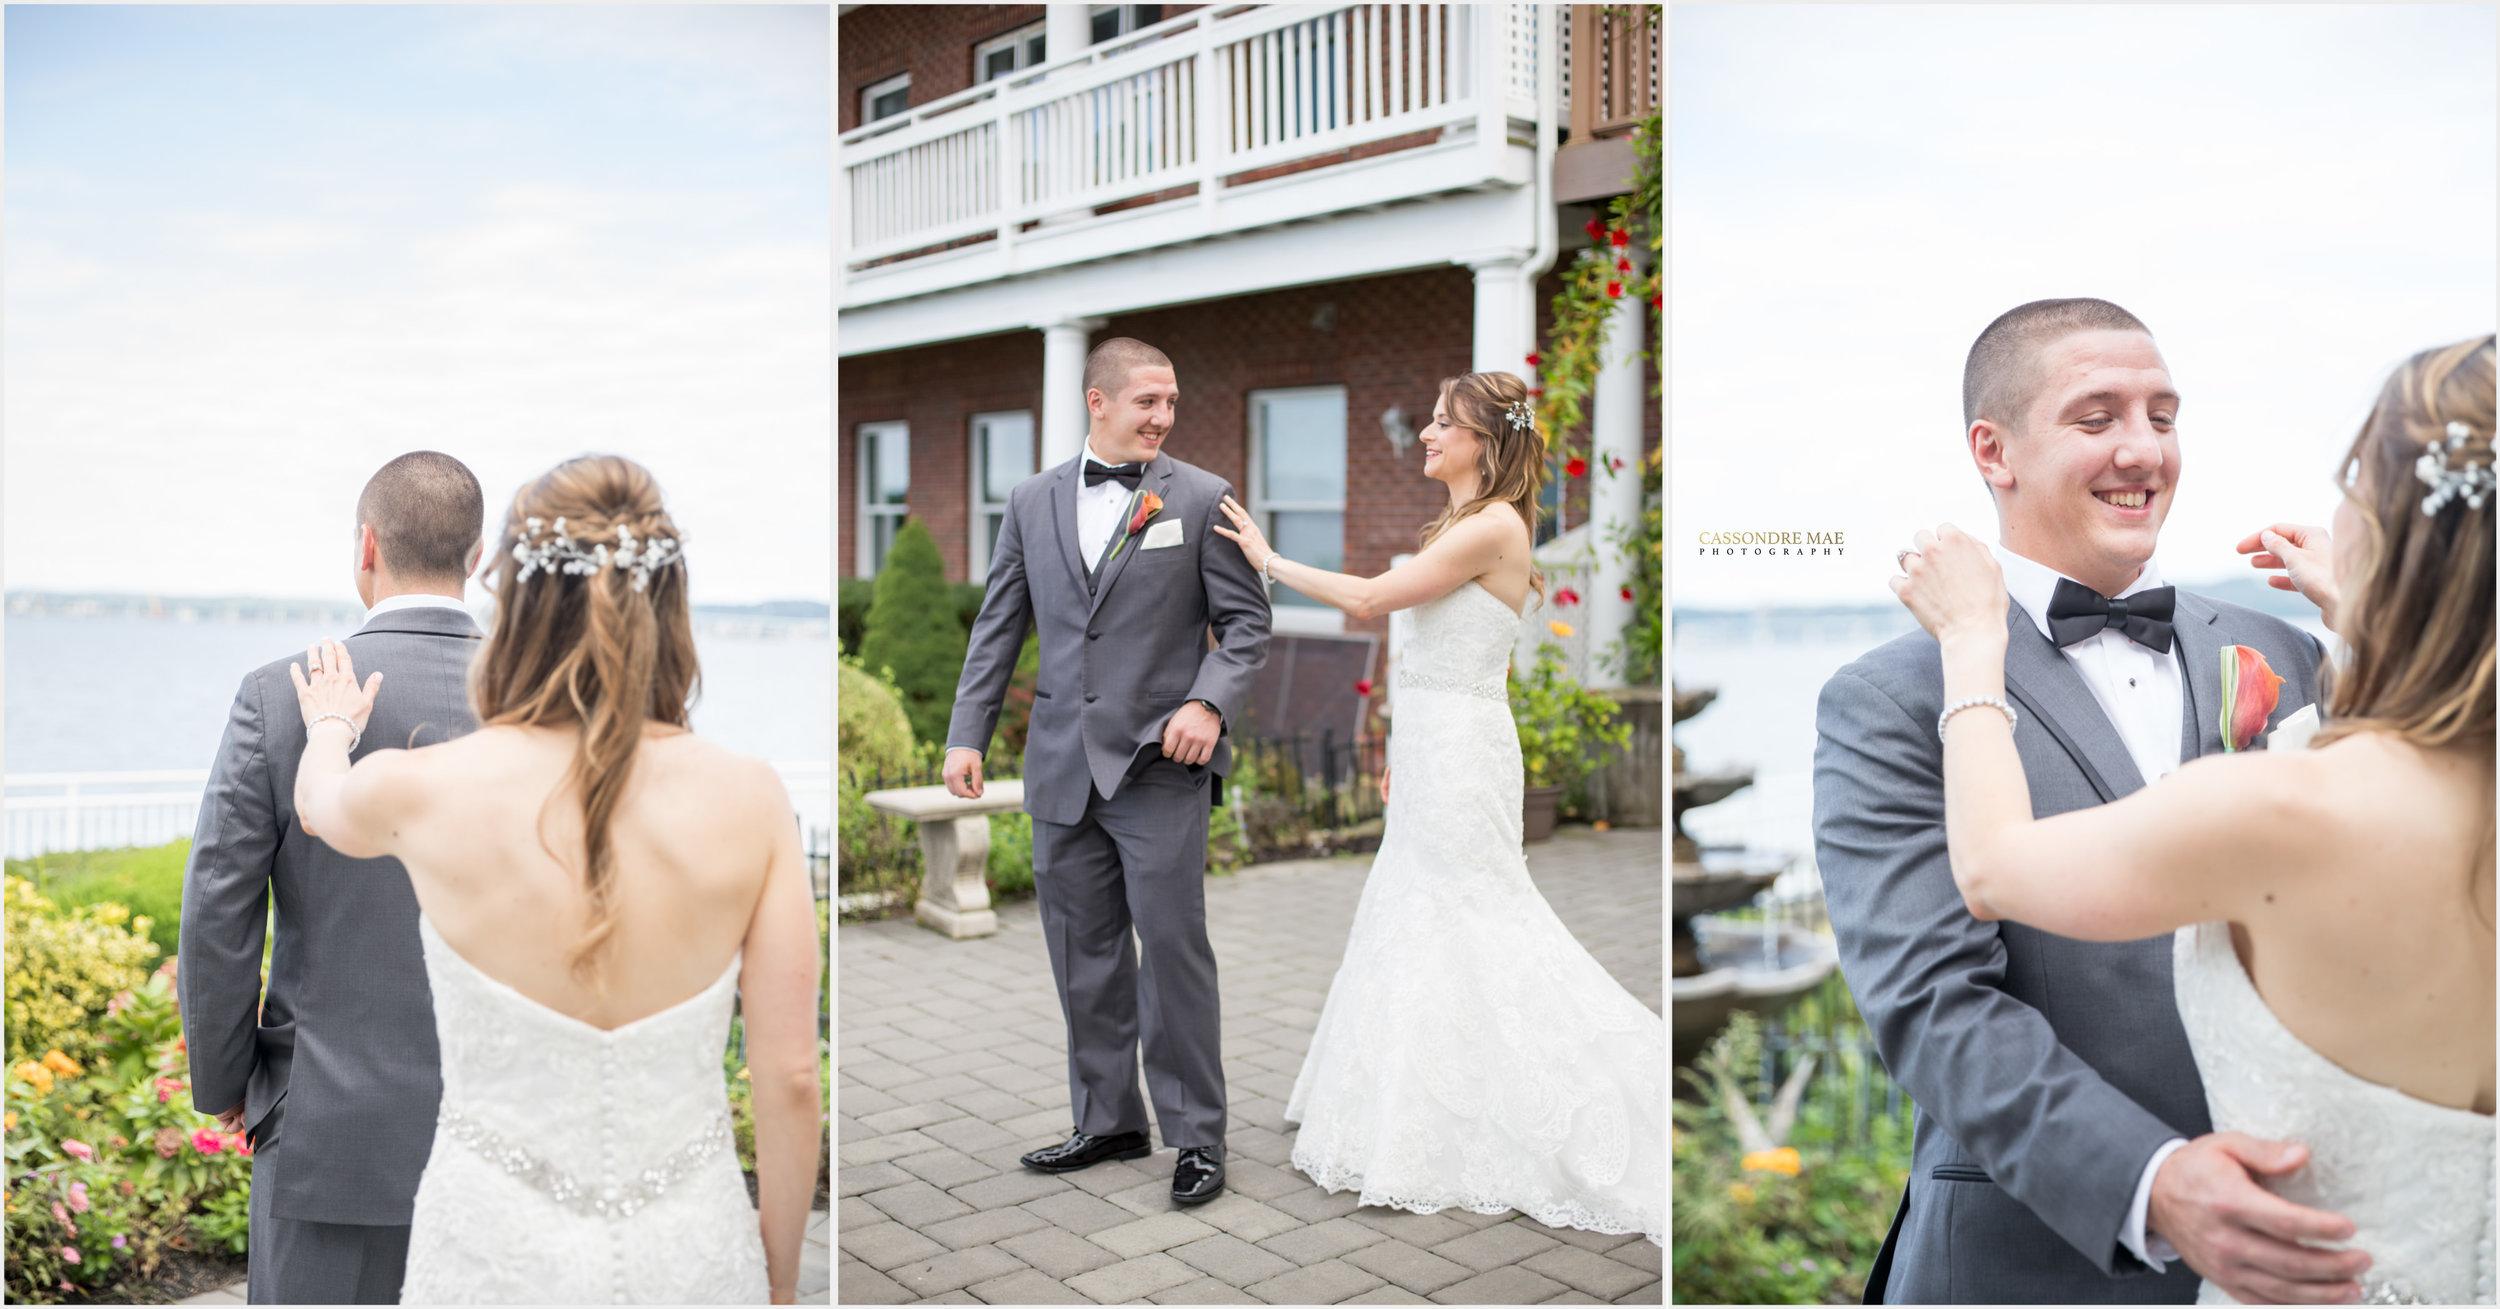 Views on the Hudson Wedding Photos Cassondre Mae Photography 15.jpg